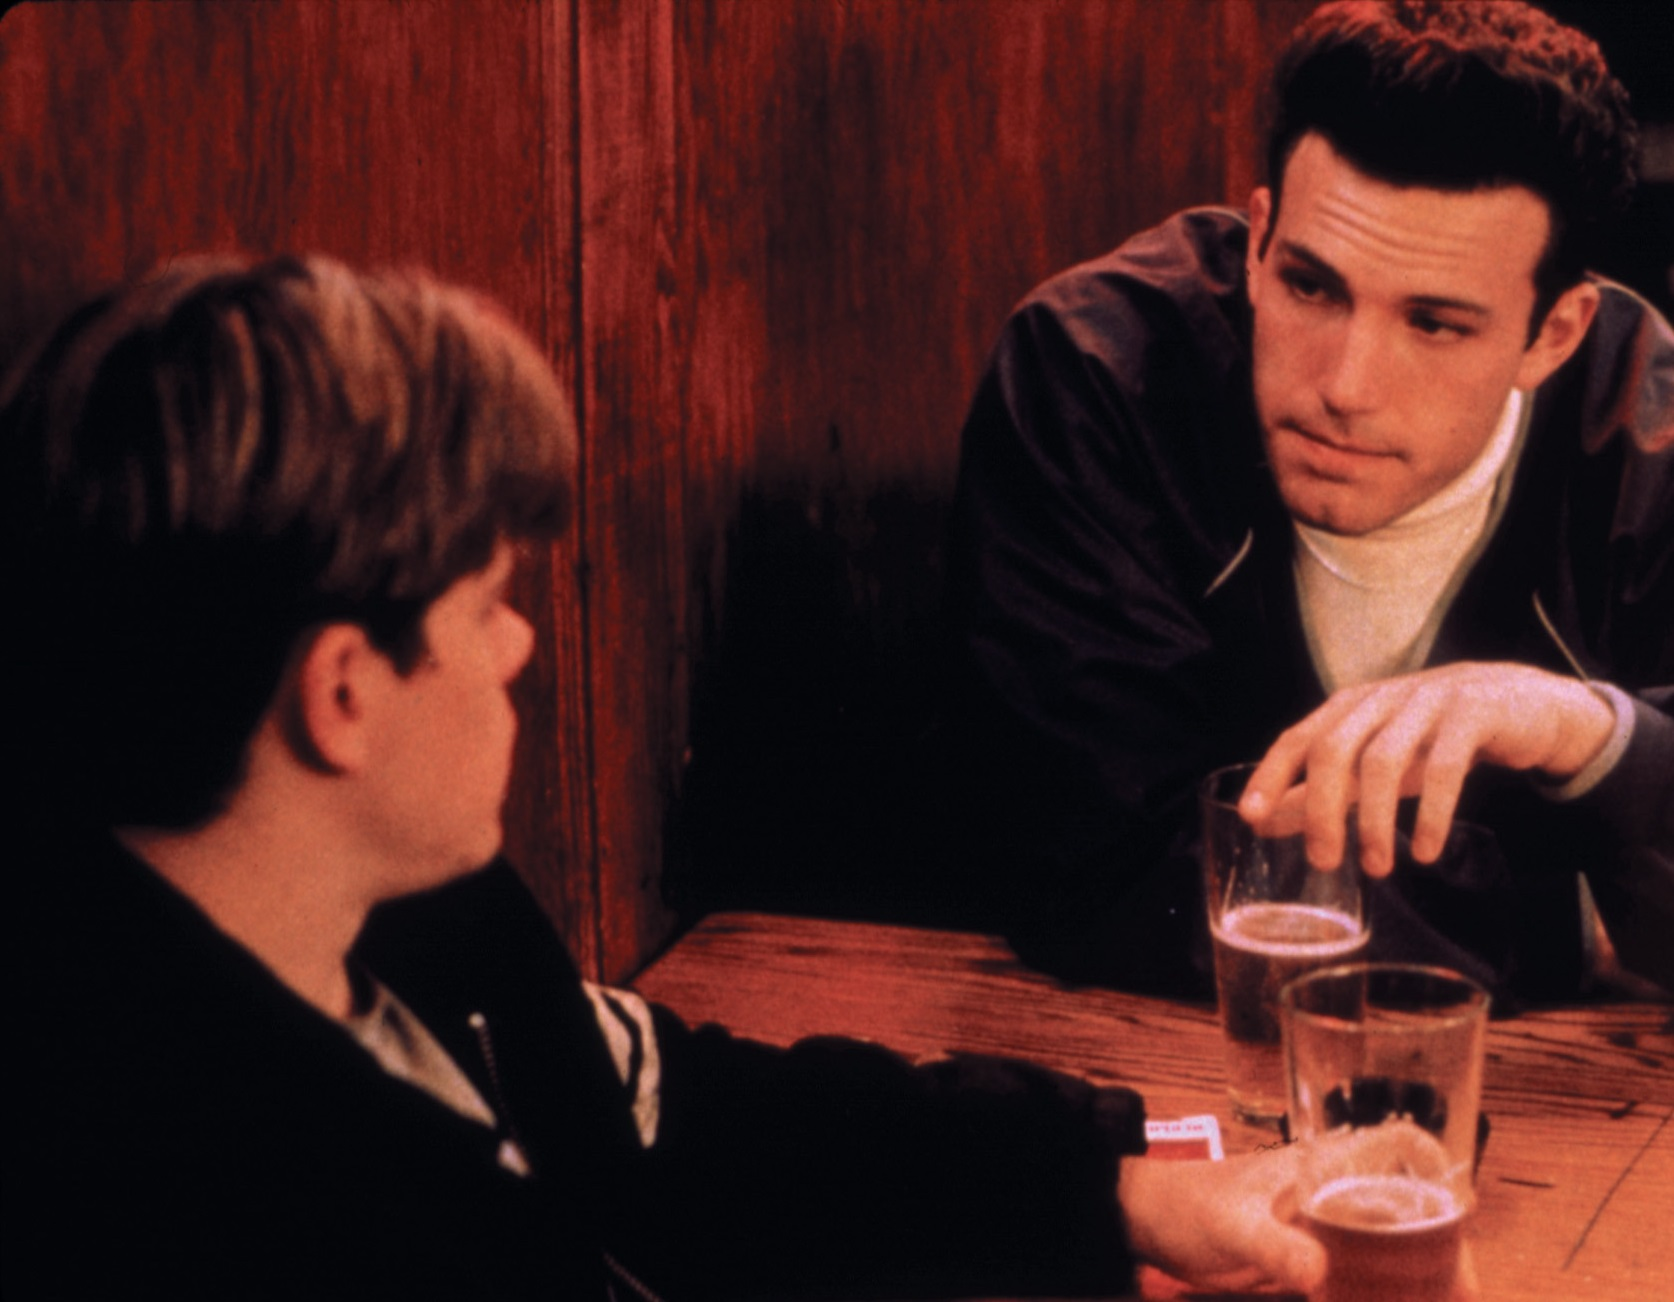 Matt Damon and Ben Affleck to team up for new TV show ...